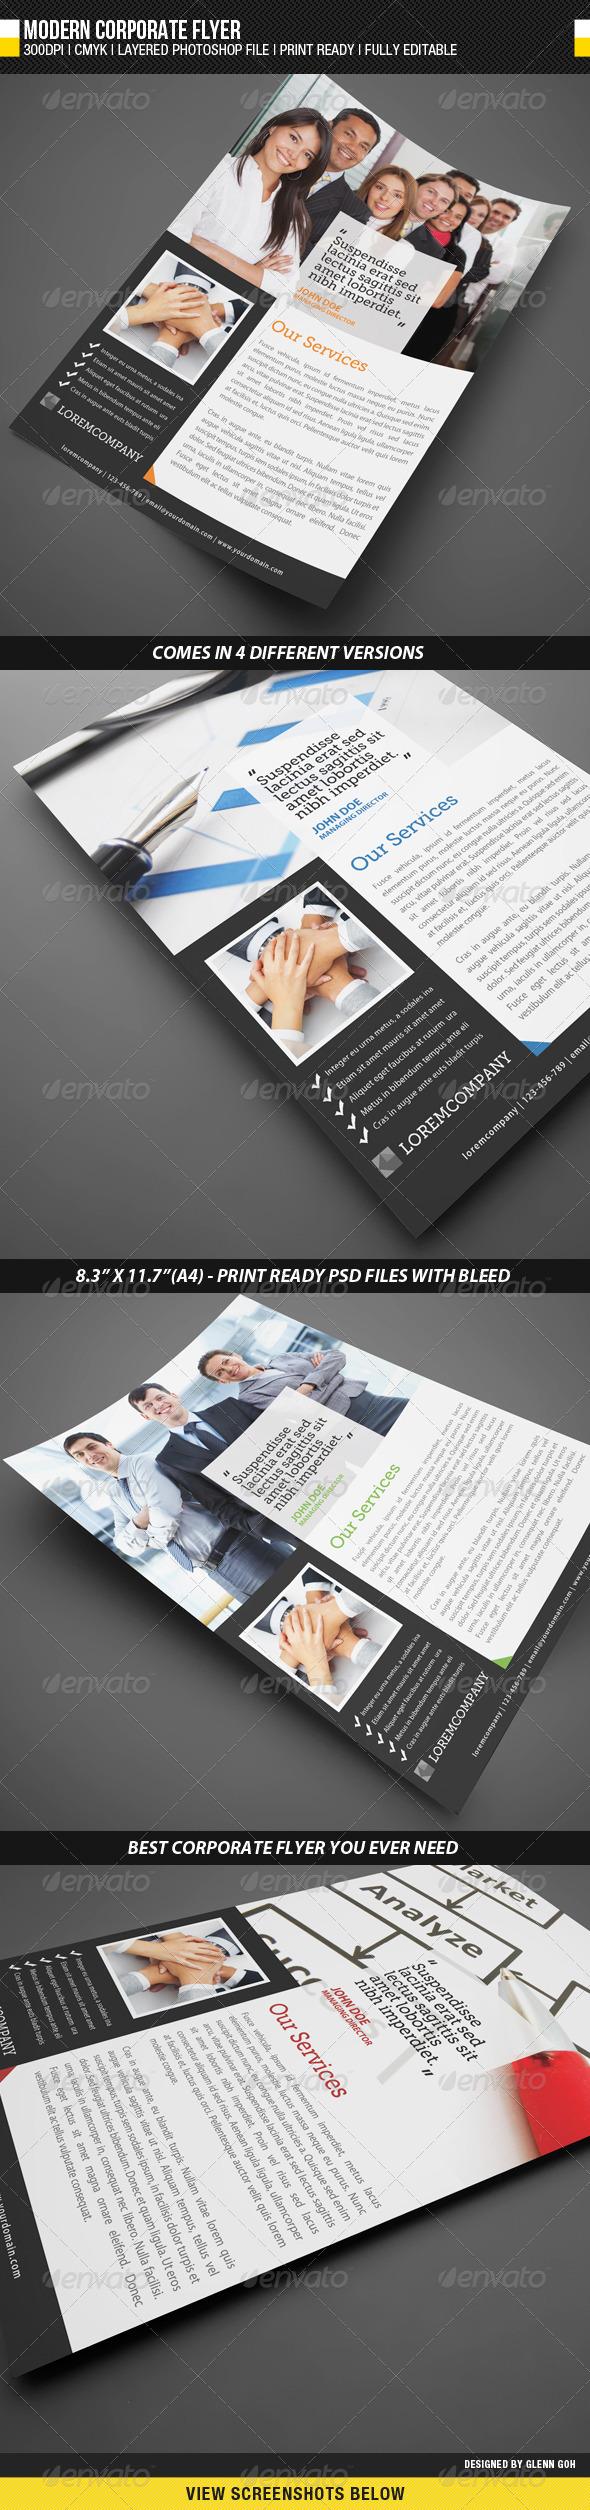 GraphicRiver Modern Corporate Flyer 1777132